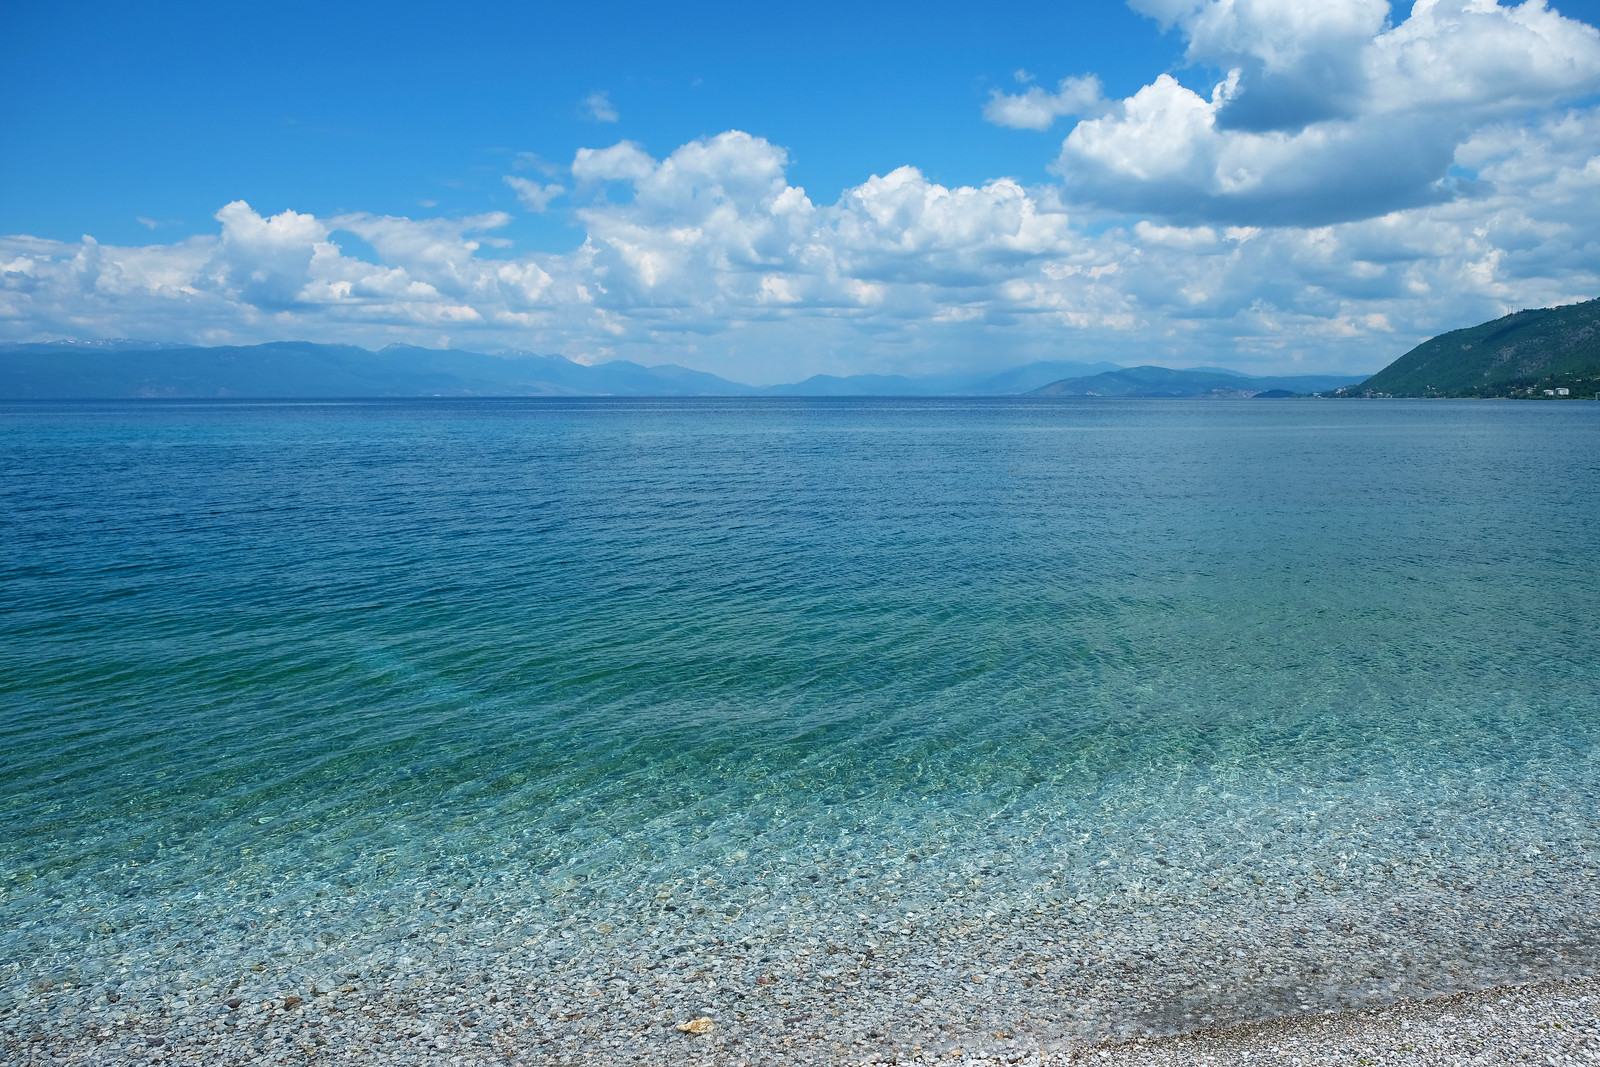 Gradishte beach, Lake Ohrid, North Macedonia